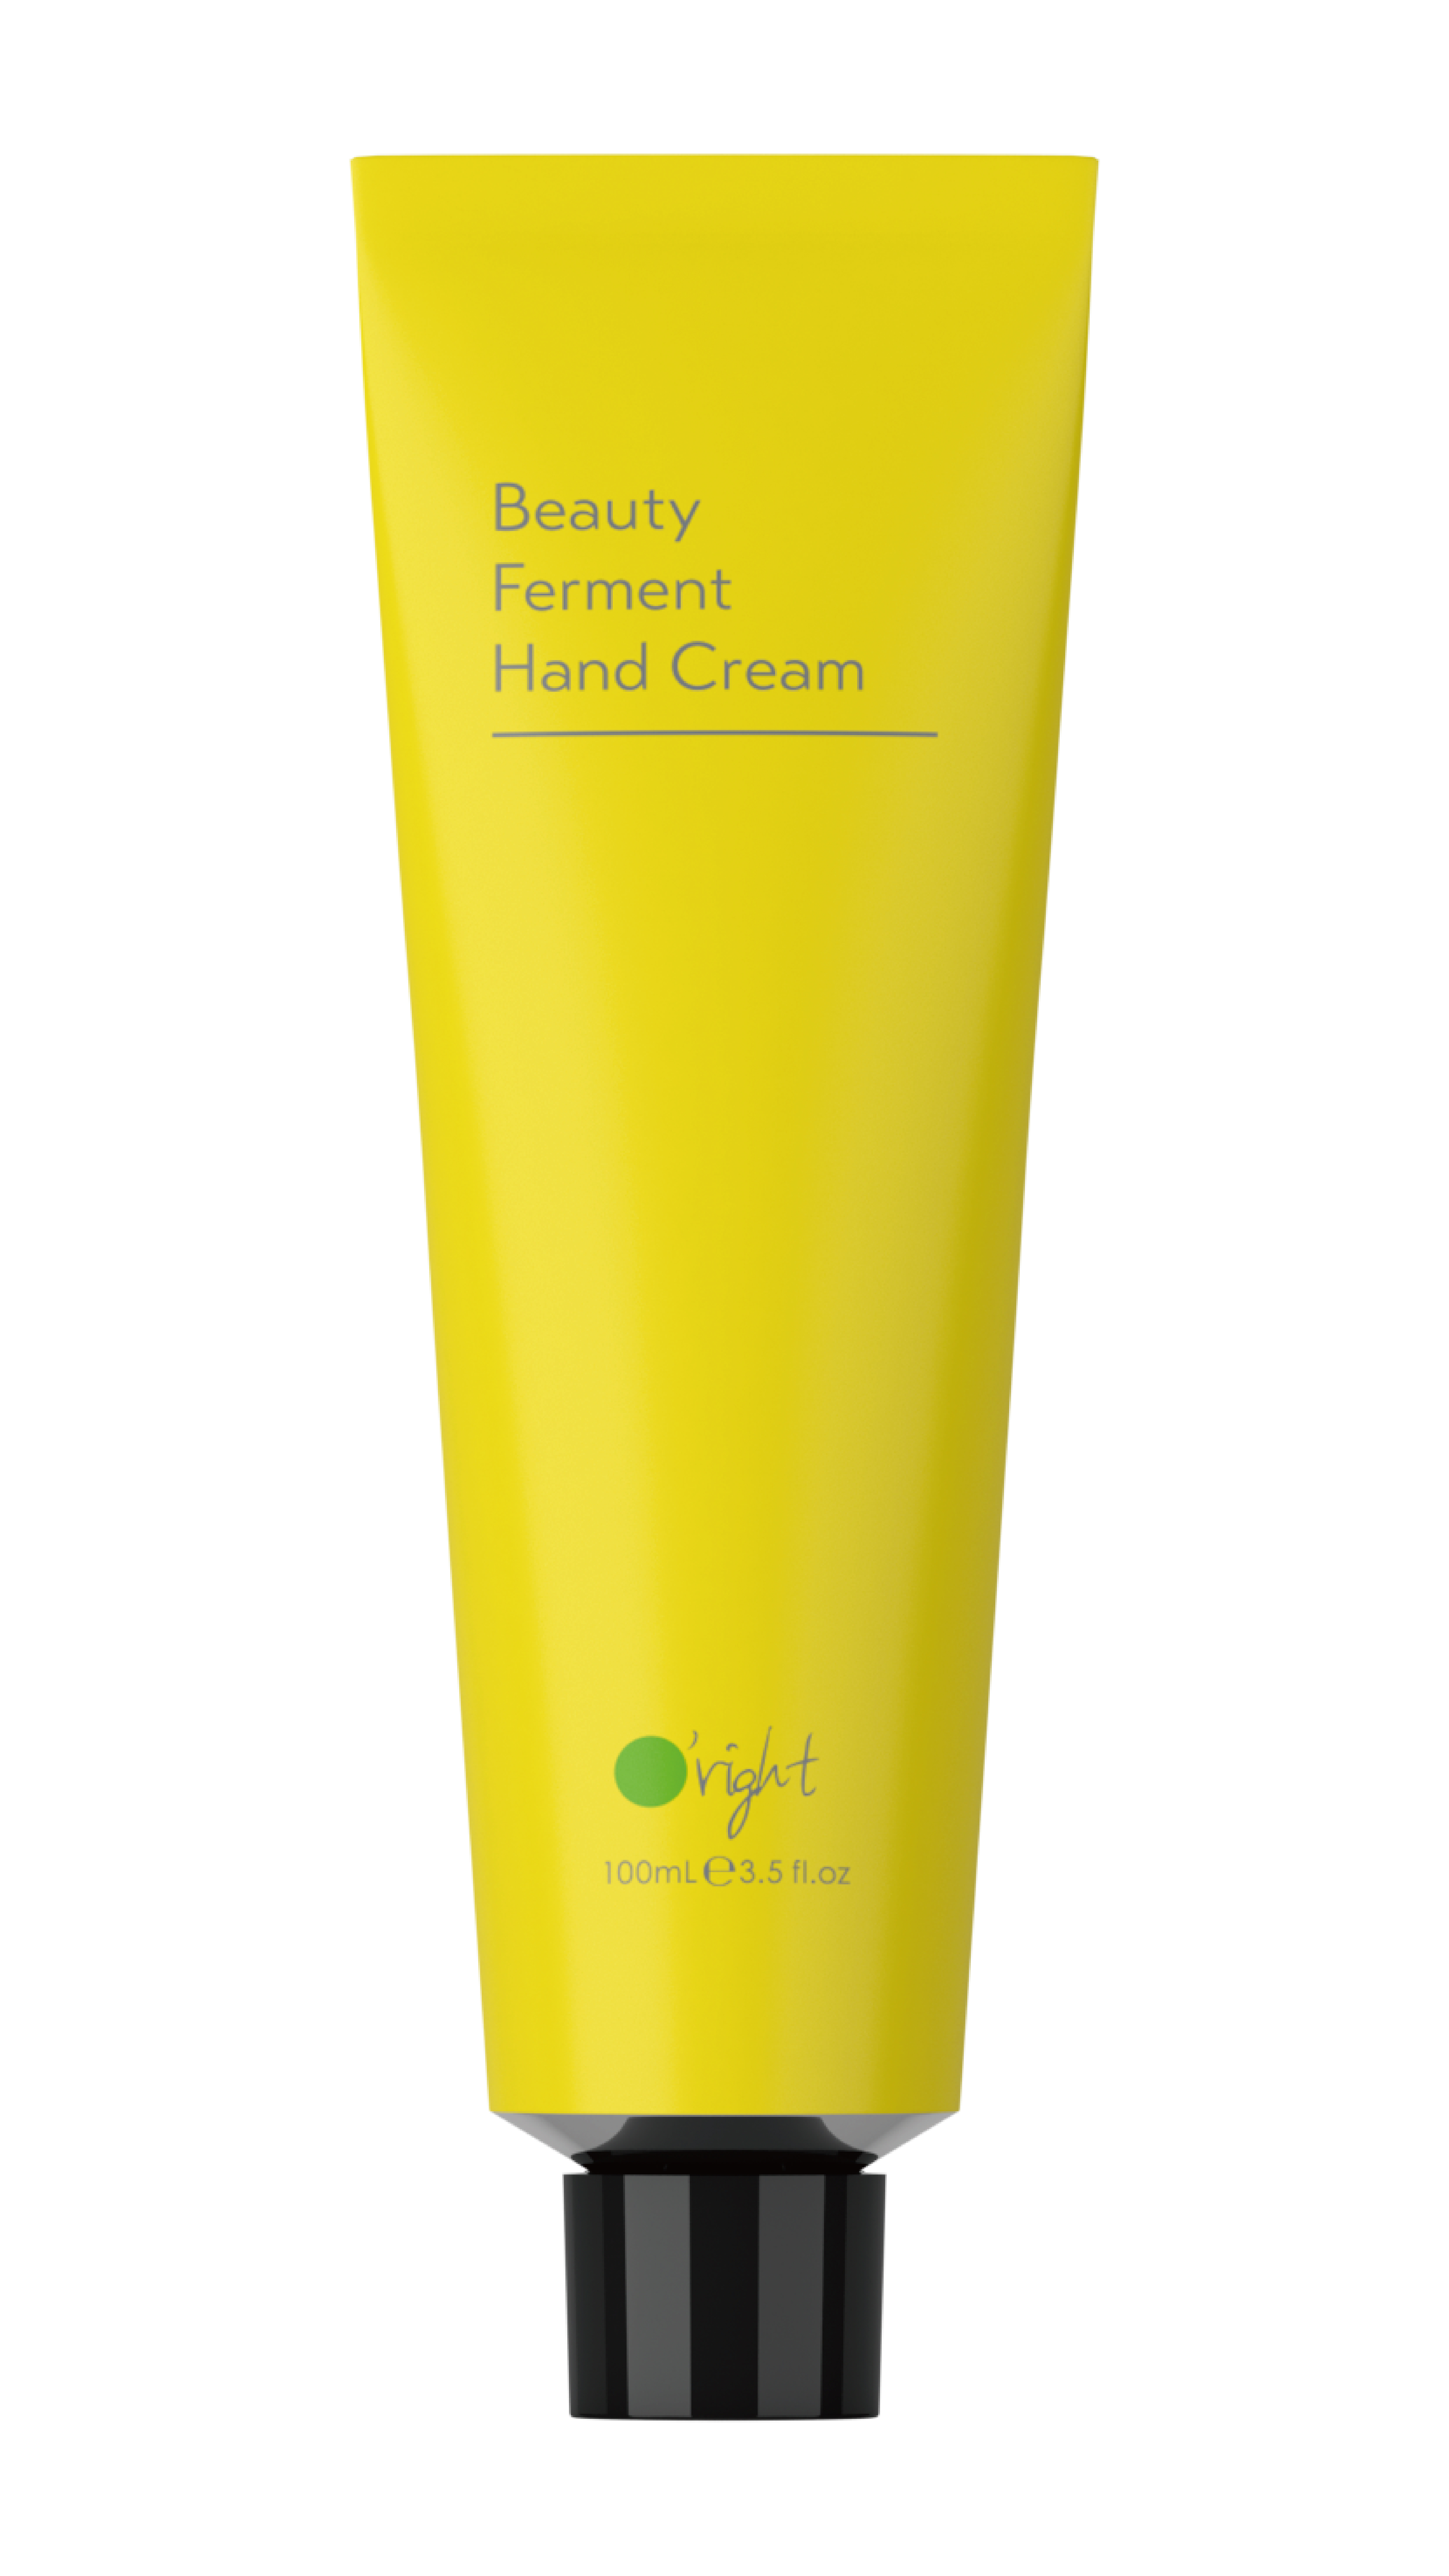 O'right Beauty Ferment Hand Cream